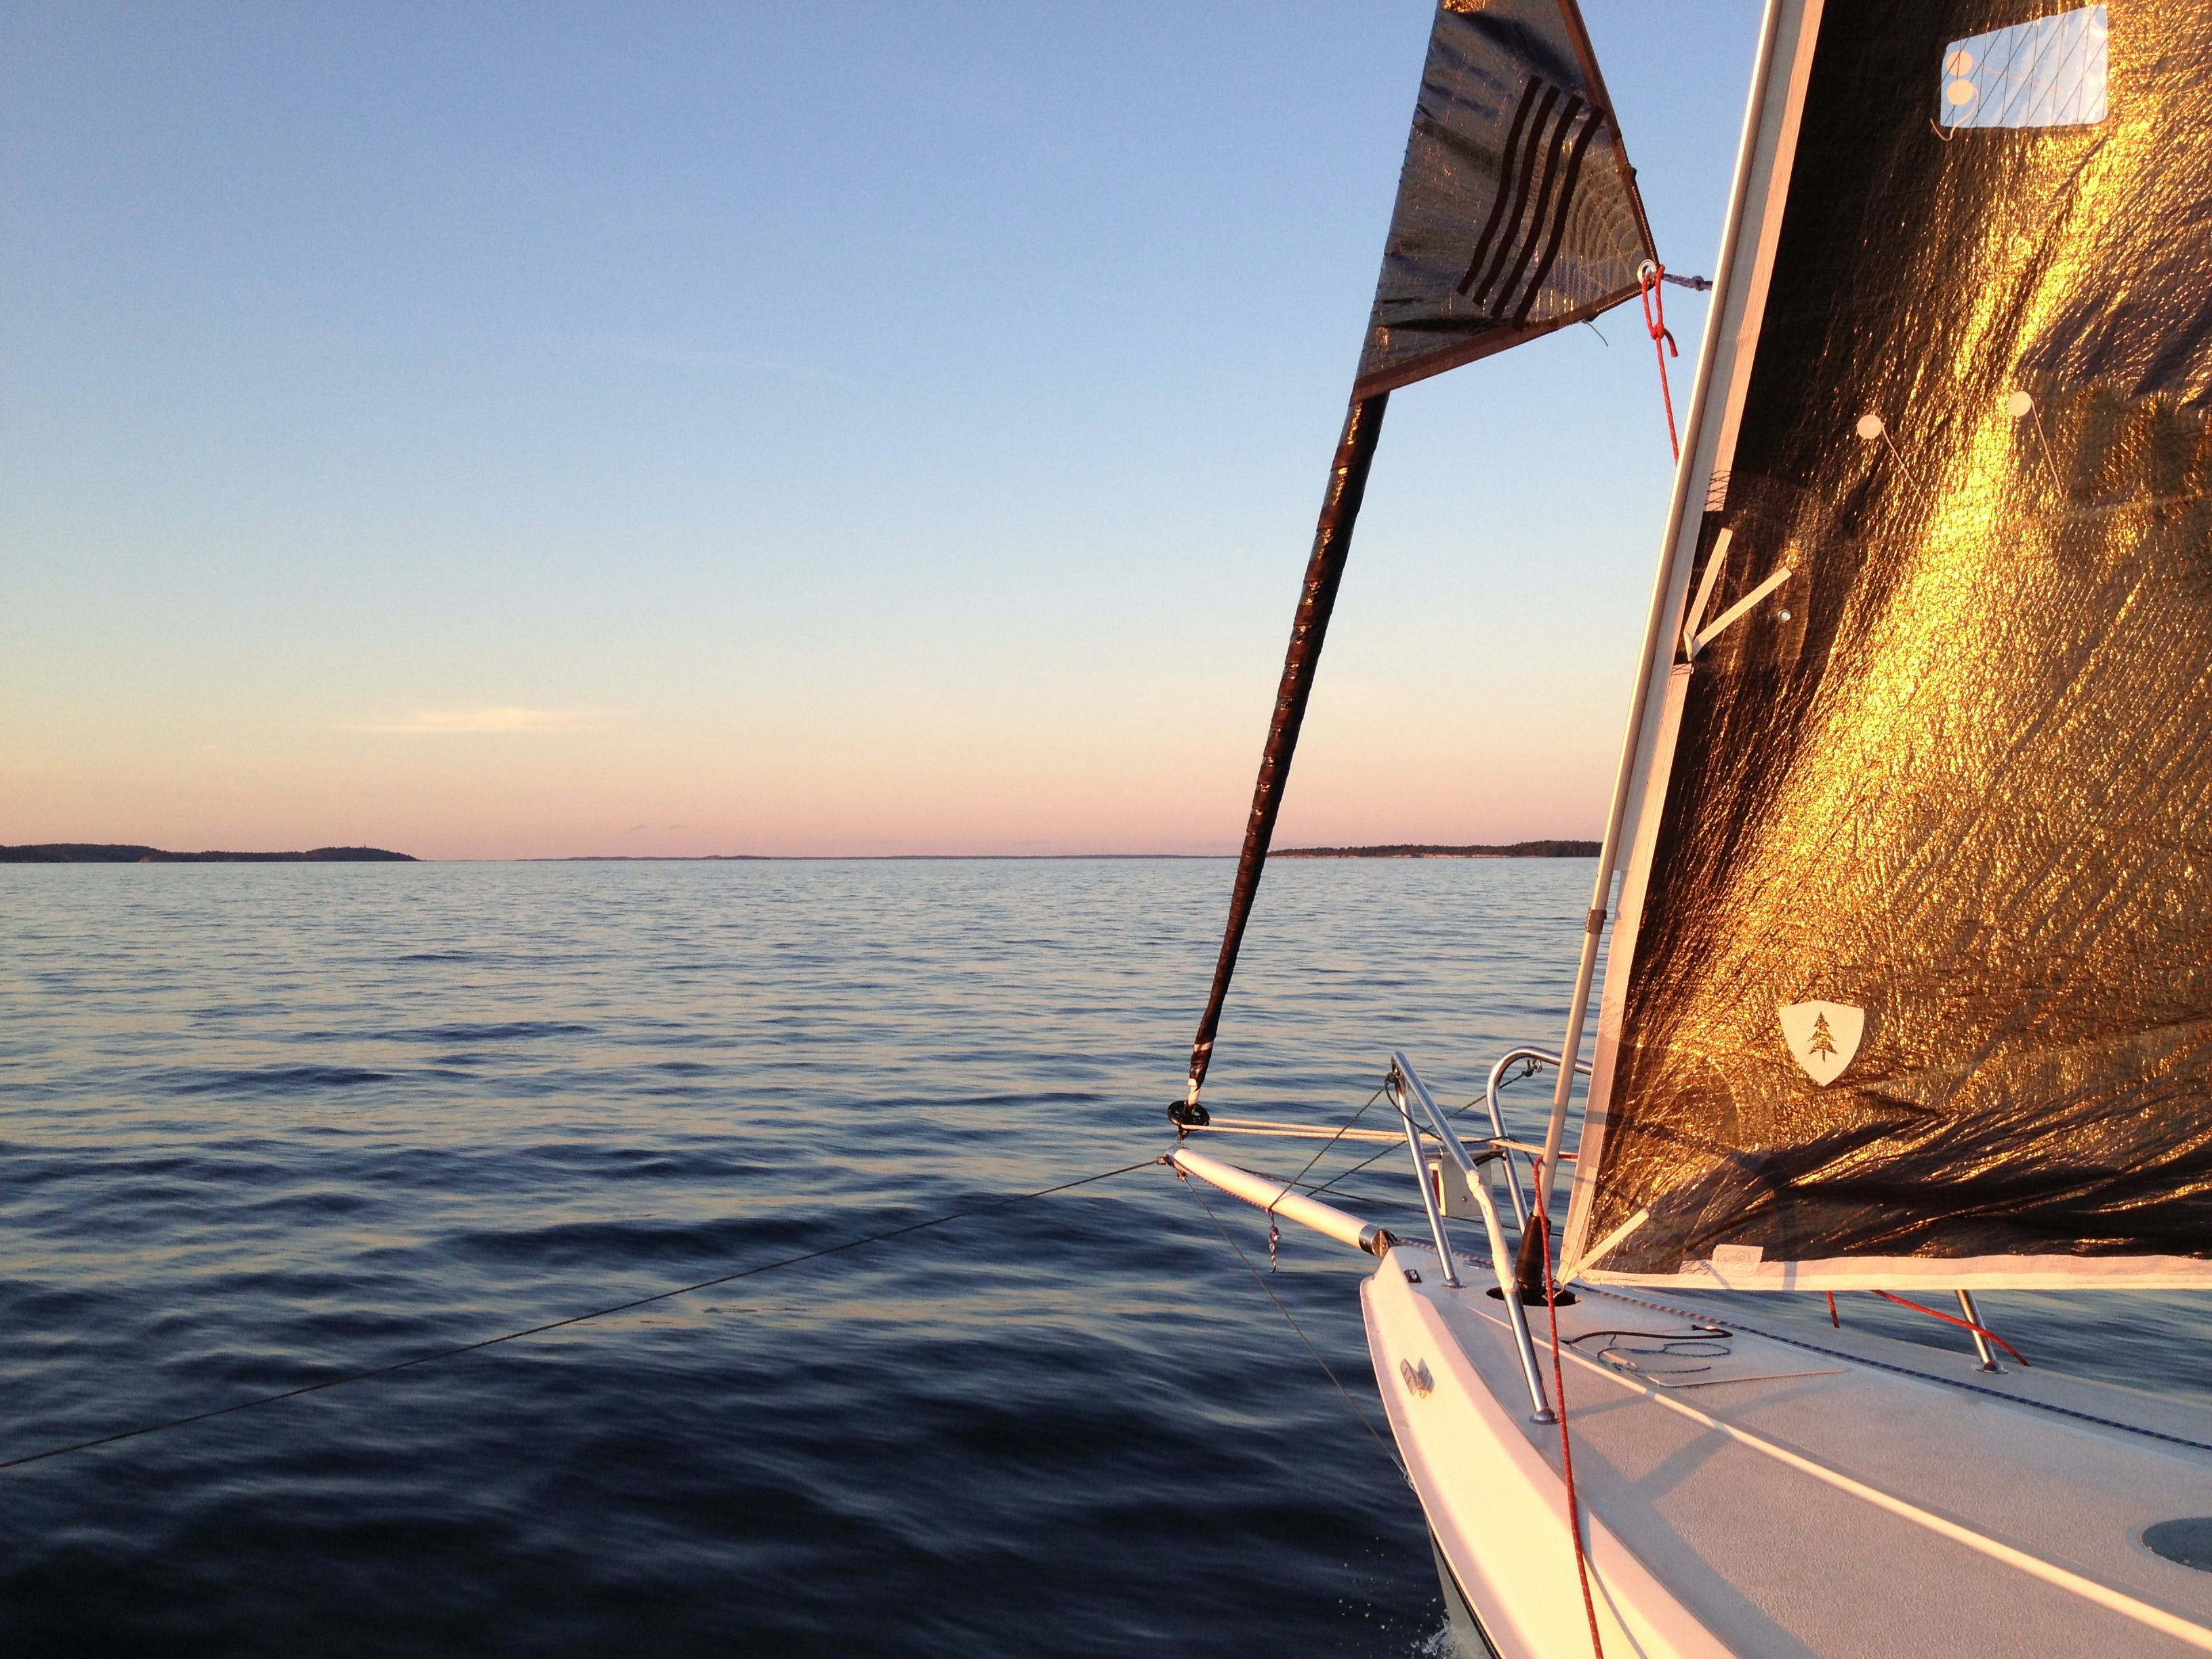 Free stock photo of sea, sunset, ocean, sailing